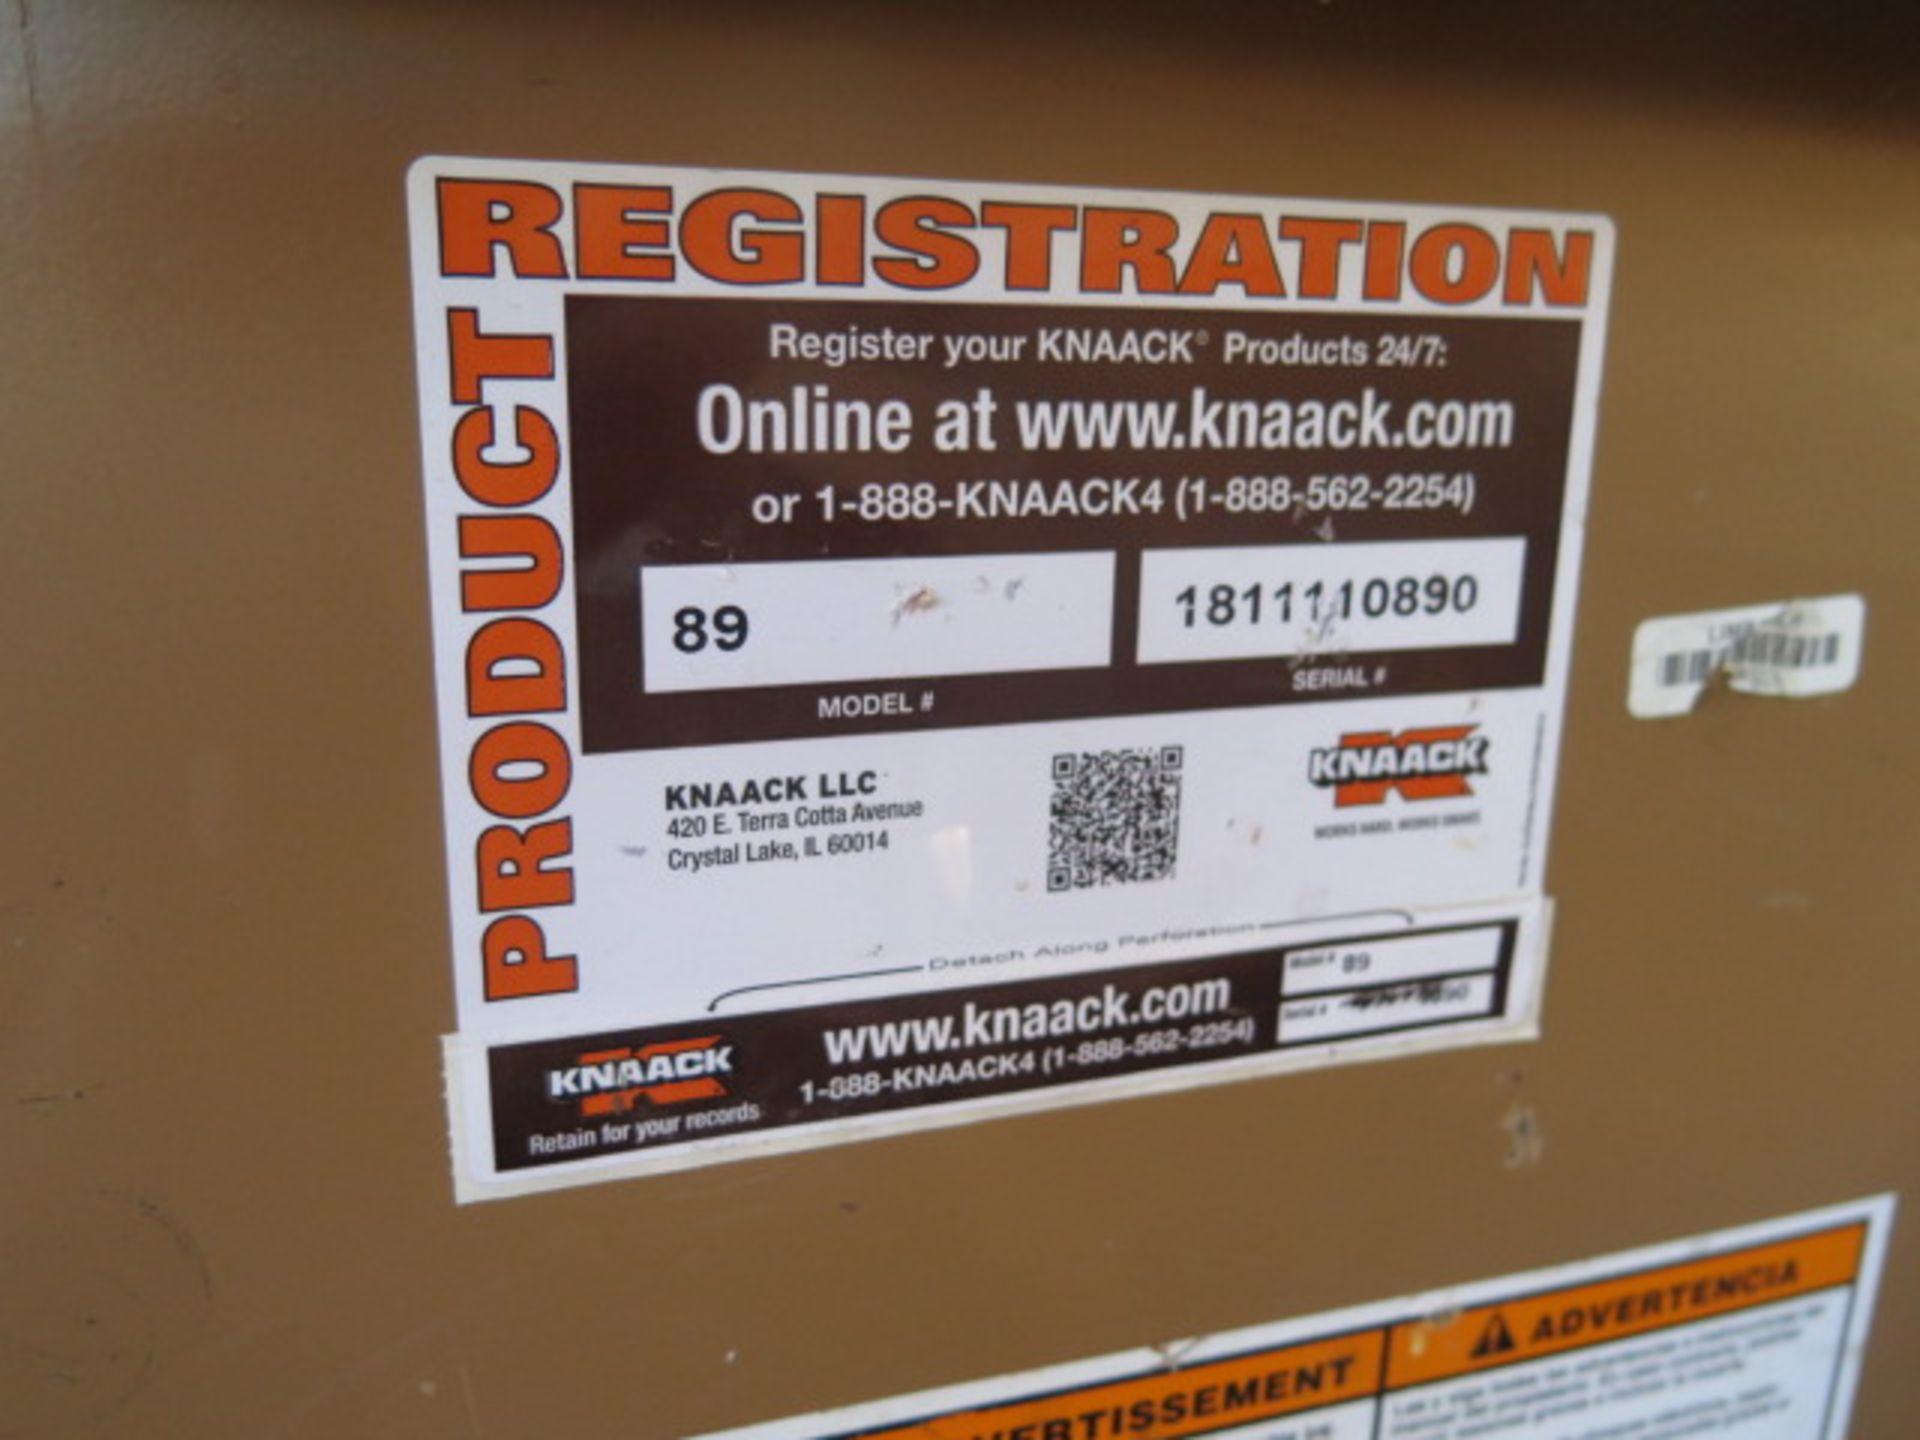 Knaack mdl. 89 Storagemaster Rolling Job Box w/ Ridgid Tri-Stands (SOLD AS-IS - NO WARRANTY) - Image 11 of 11